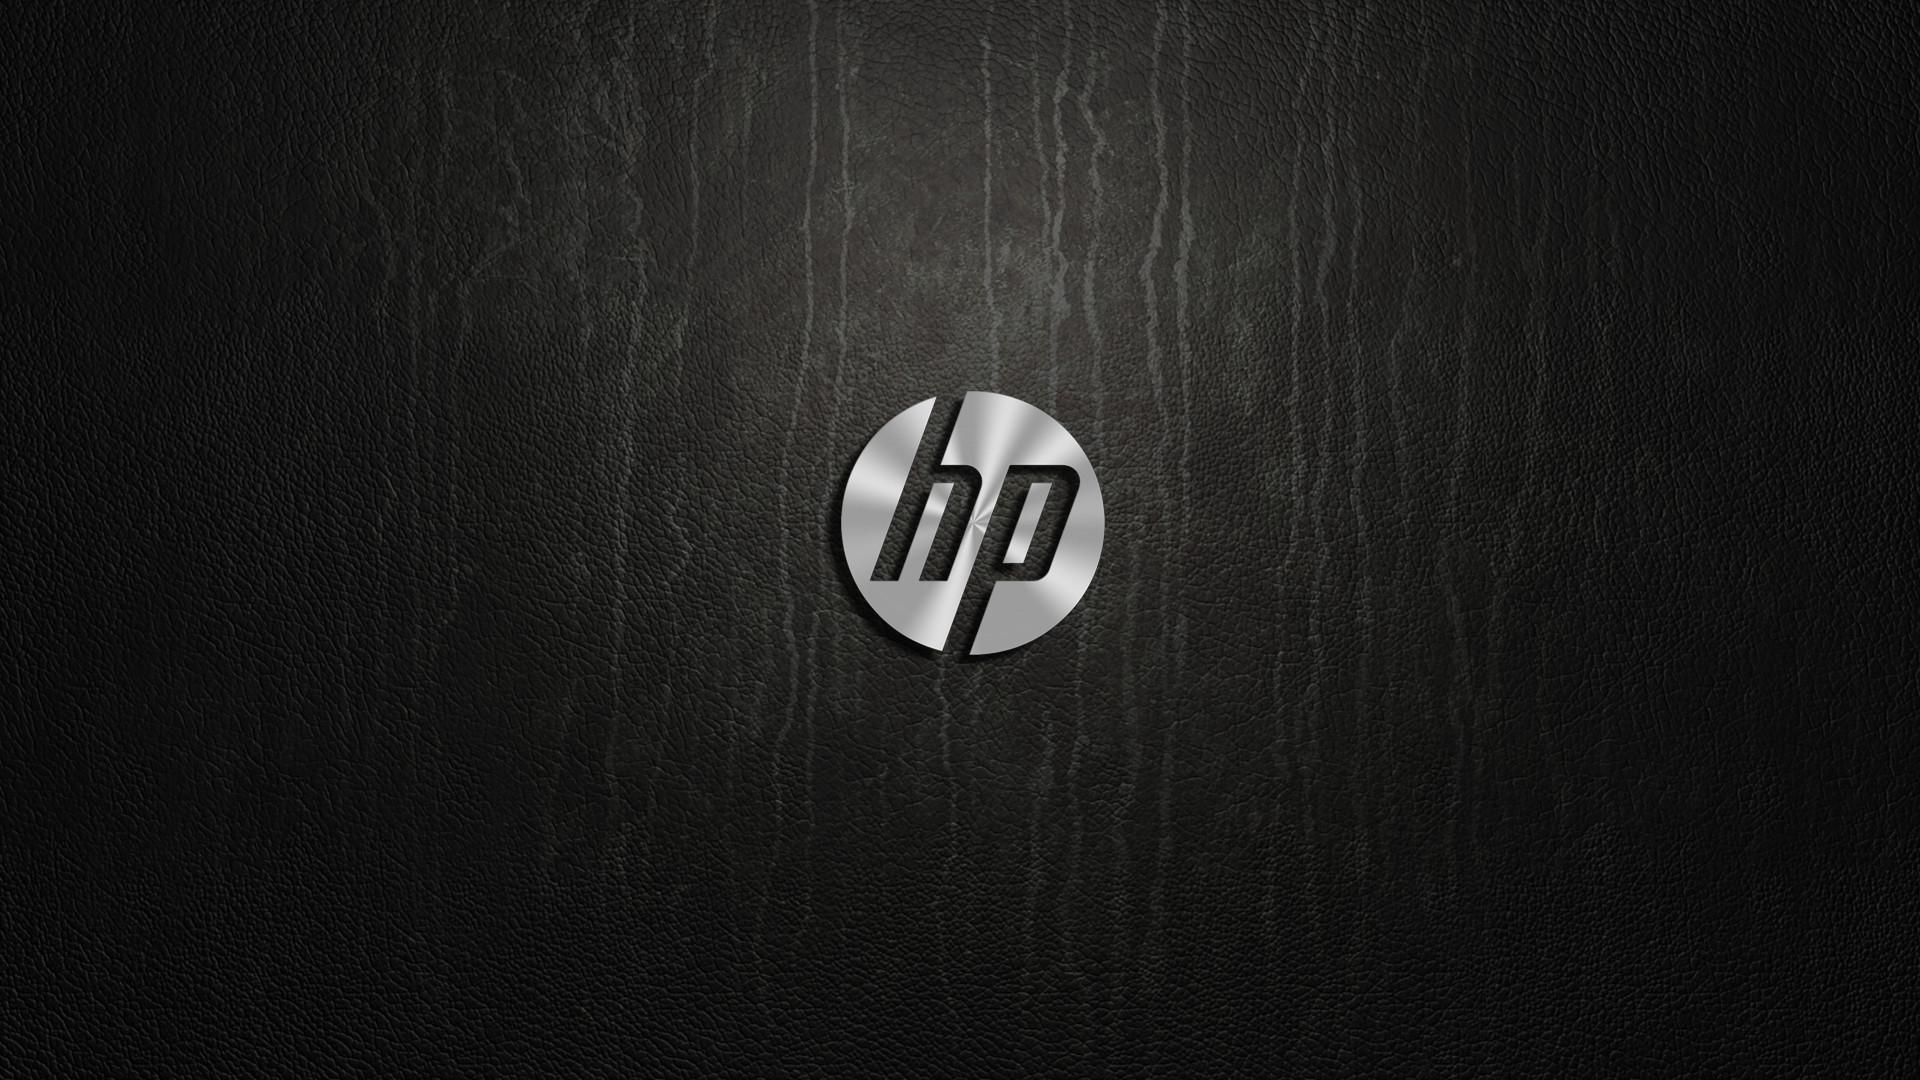 Hp 4k Wallpaper 70 Images